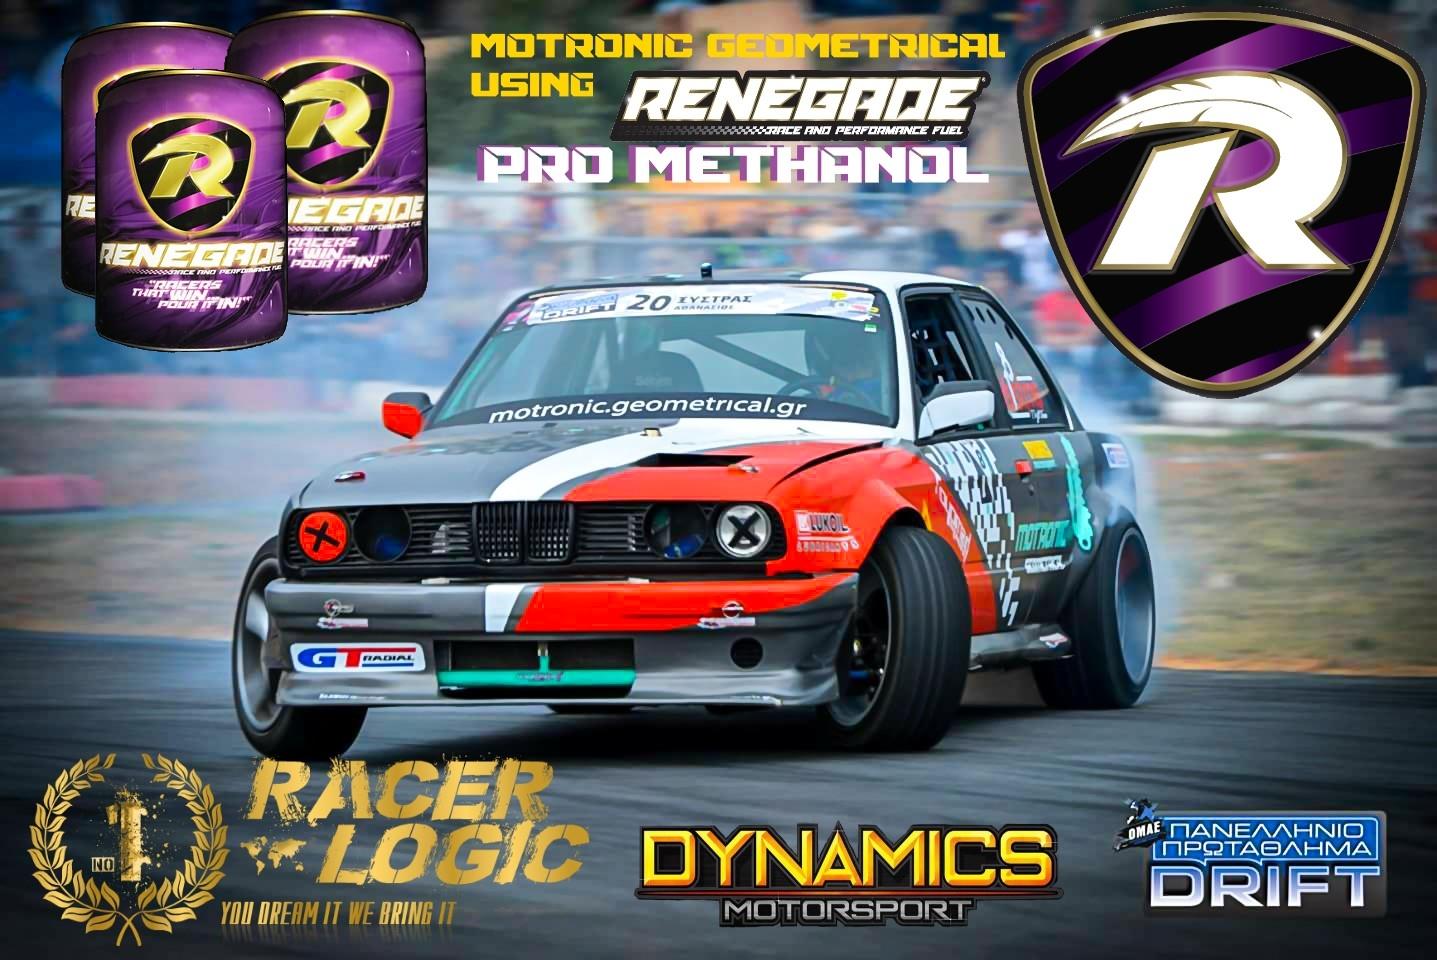 Sponsoring Drifting Pro Motronic Geometrical - Xystras